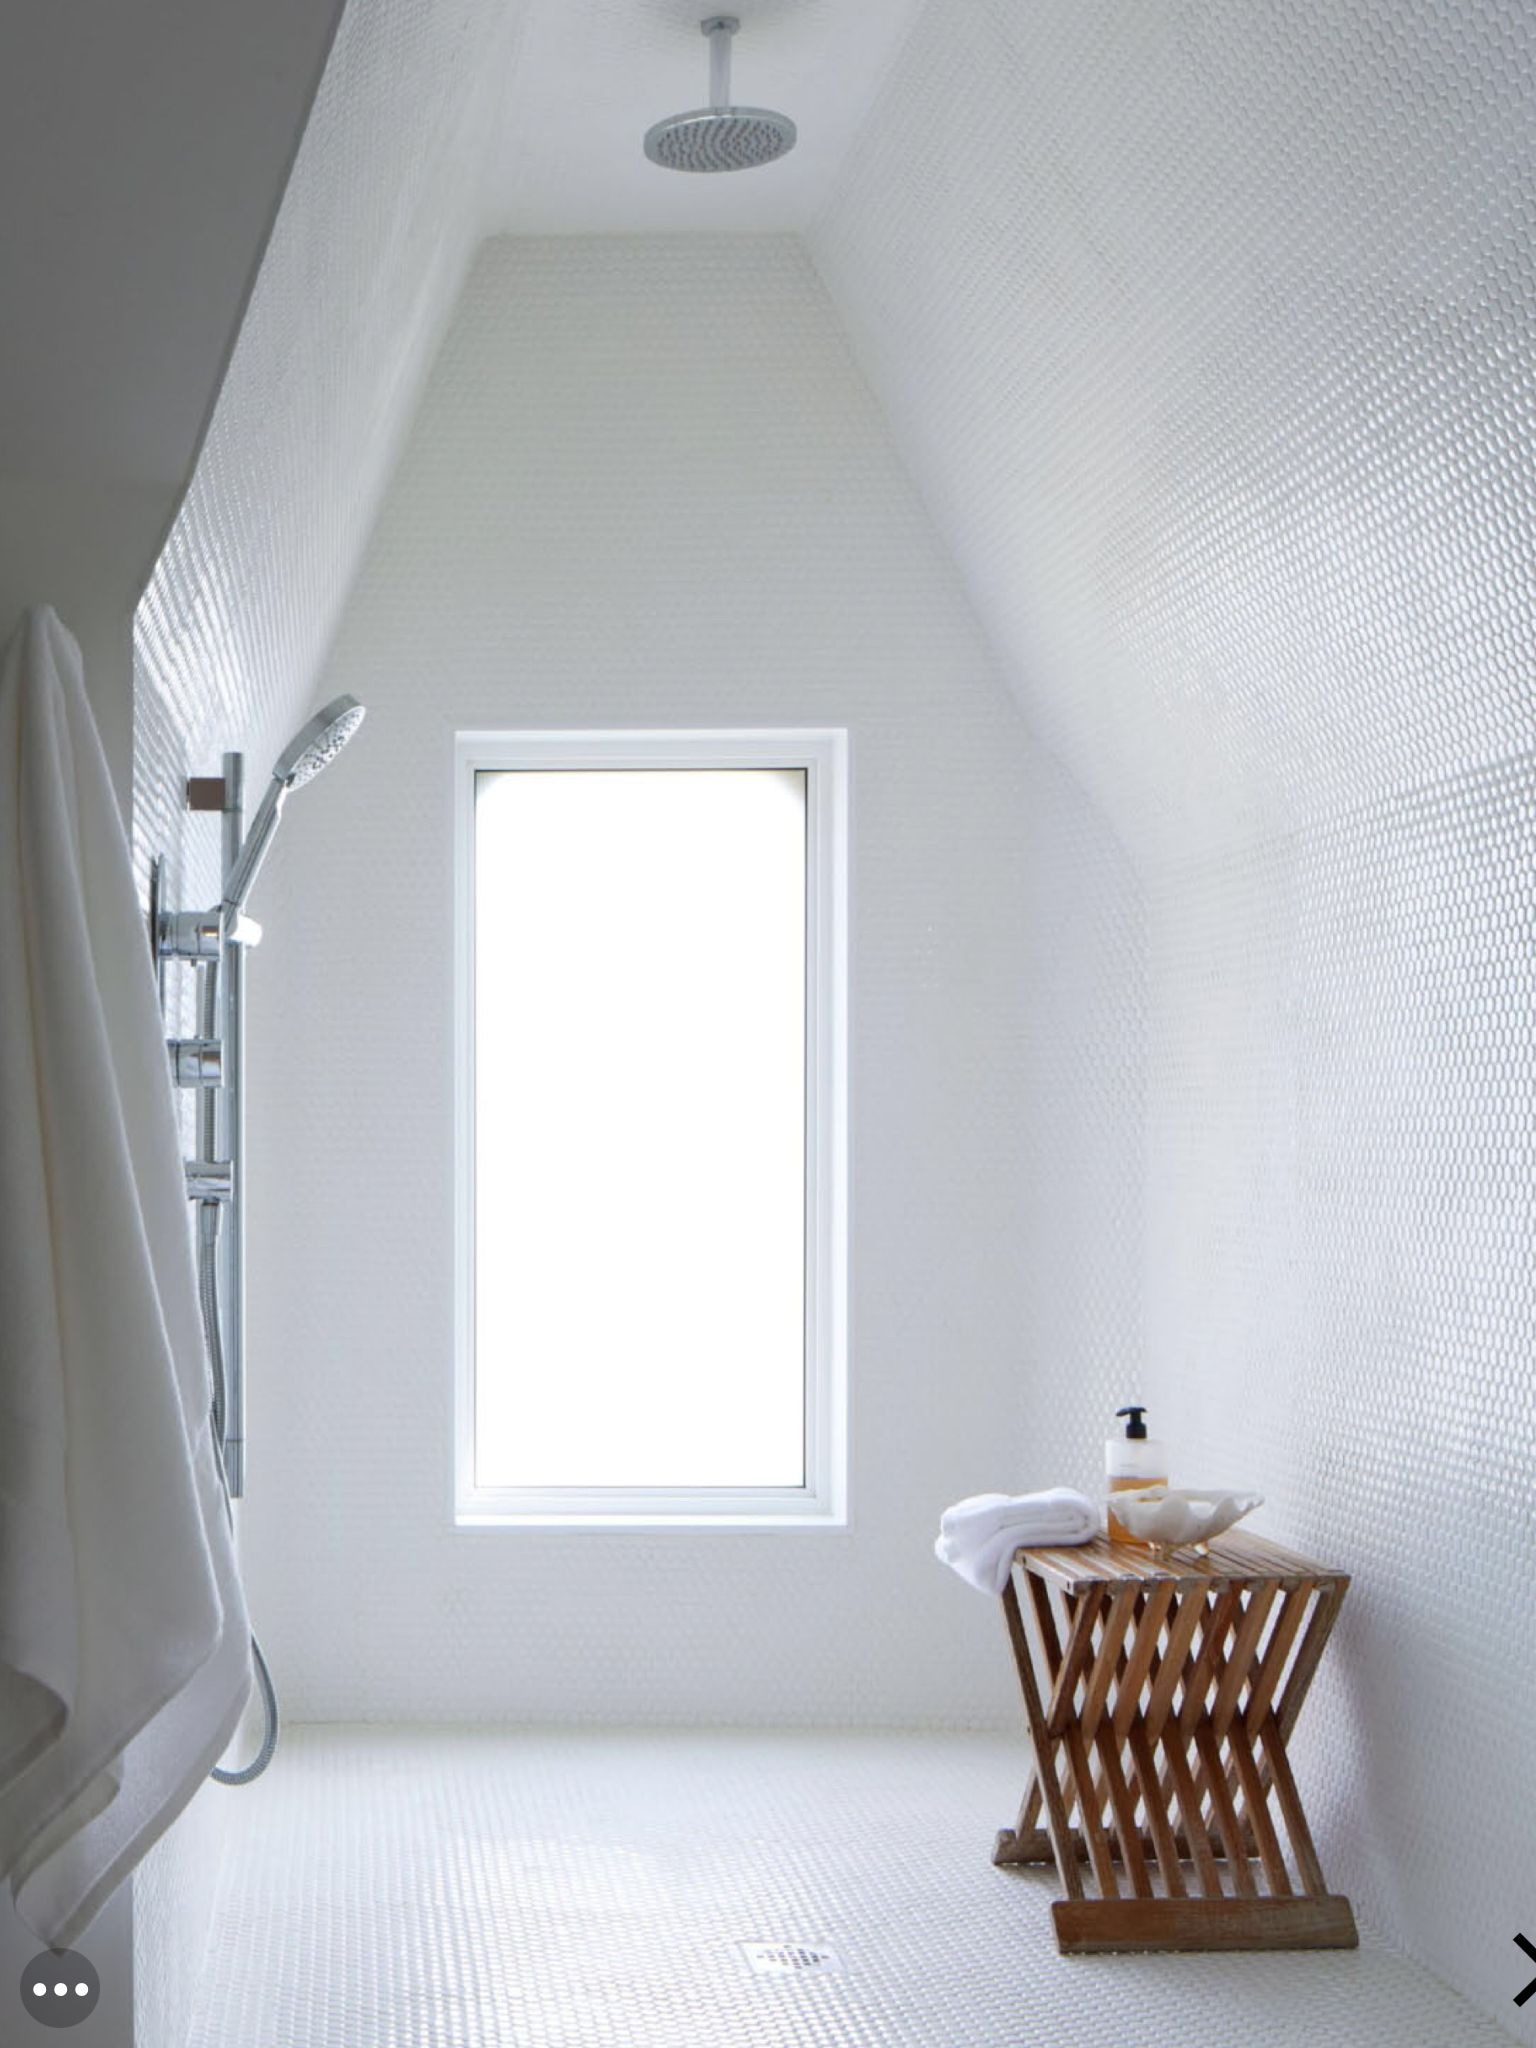 Toronto bathroom by Youssef Hasbani | Interior Design | Pinterest ...